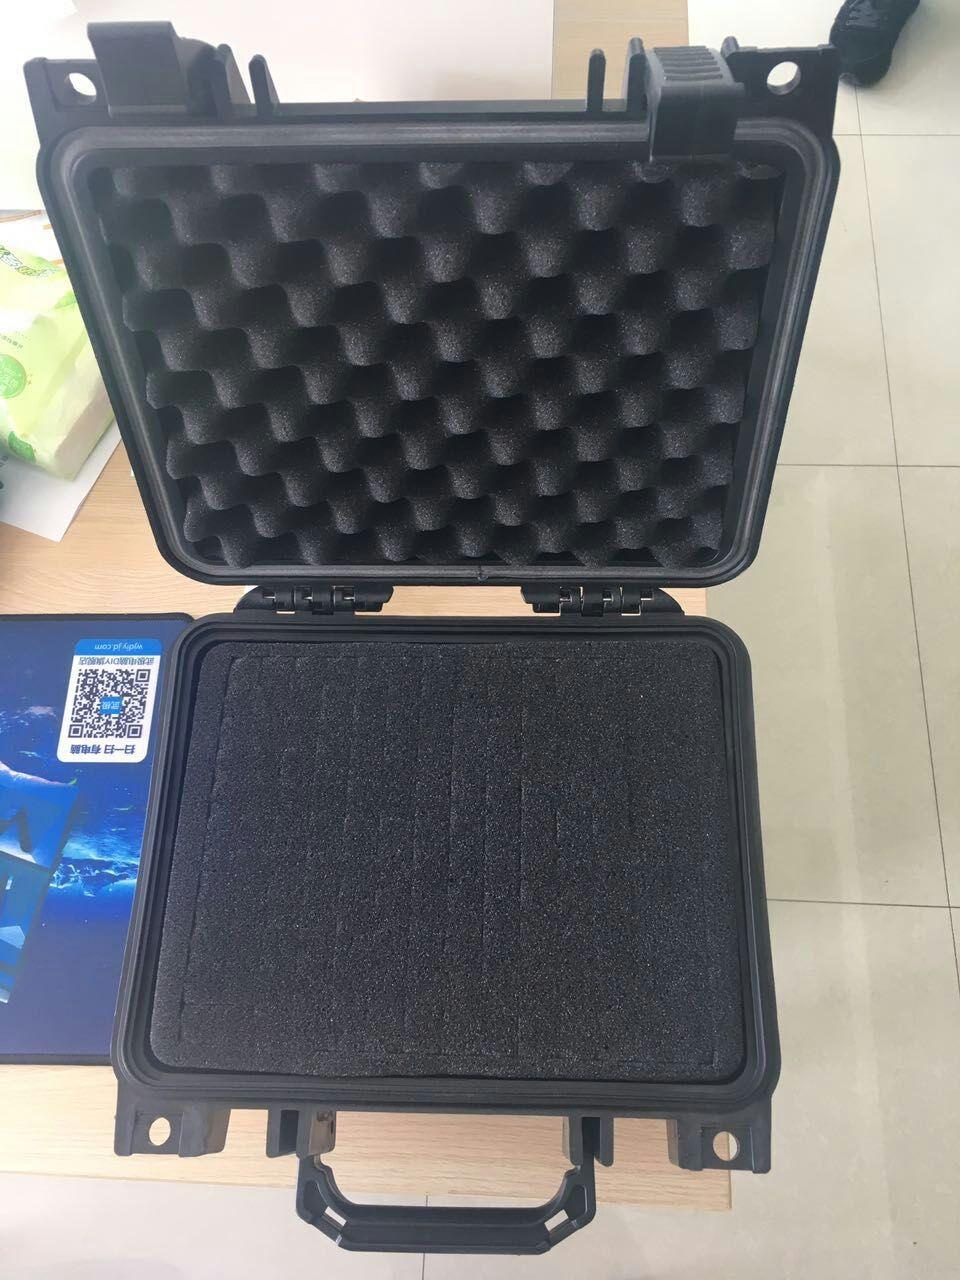 ФОТО Internal 233*178*155mm crushproof strong suitcase with standard precut foam